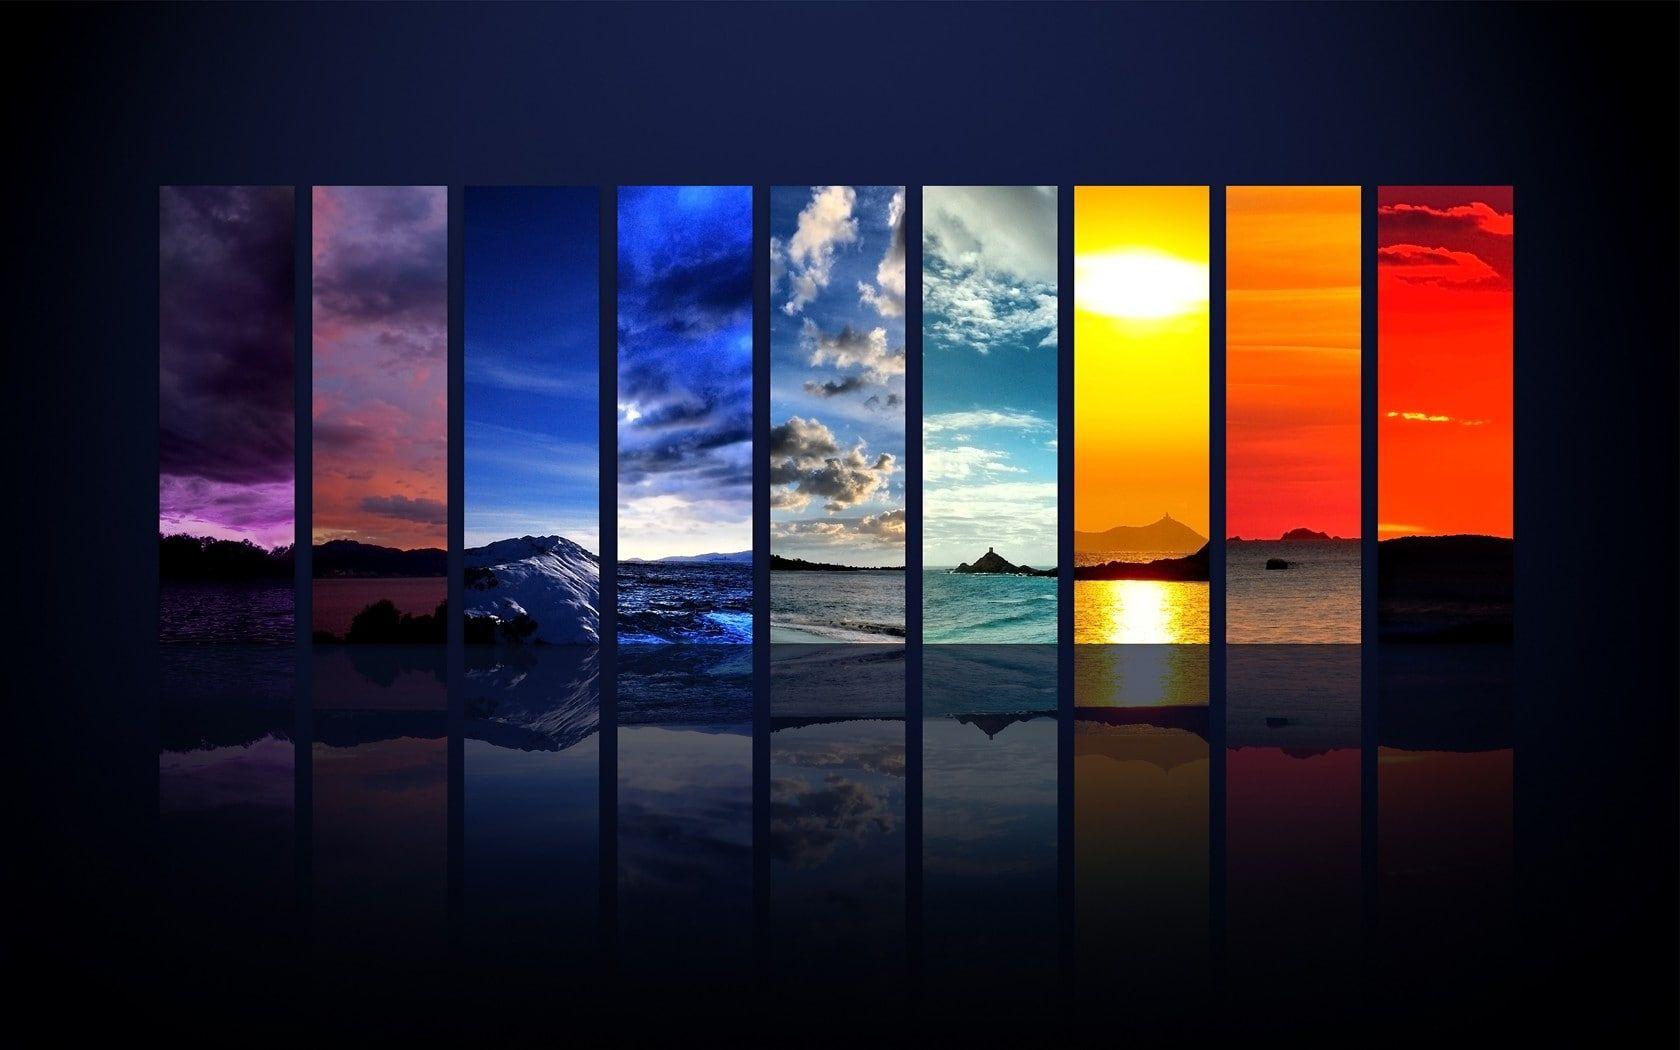 Adobe Photoshop Digital Art Four Seasons Landscape Rainbows 720p Wallpaper Hdwallpaper Desktop Wallpapers Backgrounds Graphic Wallpaper Rainbow Wallpaper